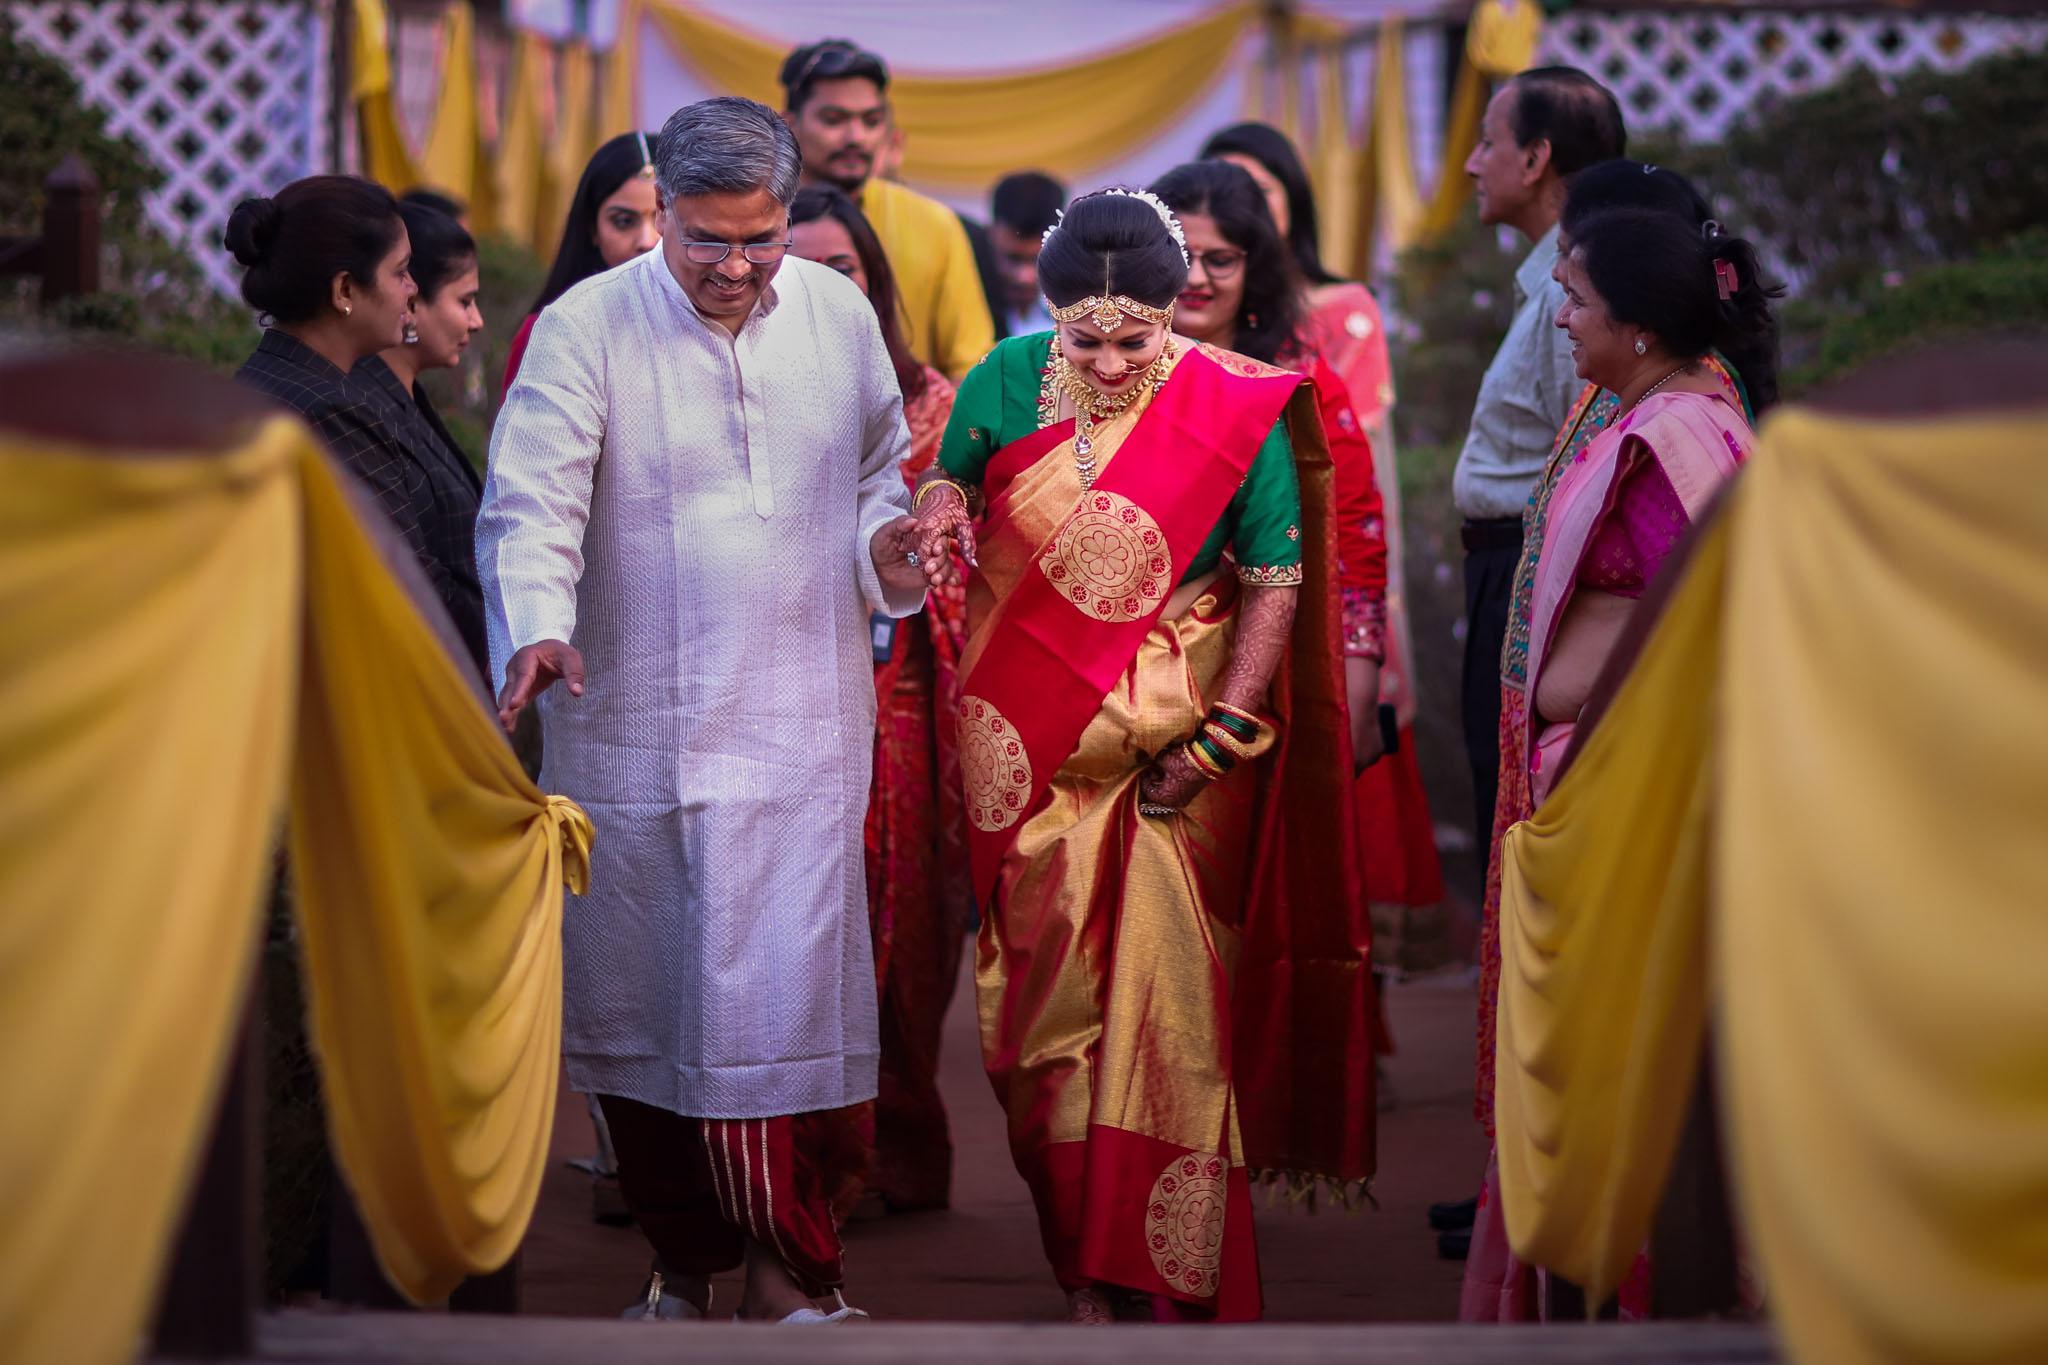 Mukti x Ojas Wedding Akshjay Sansare Photography Best wedding photographer in mumbai India Candid Cinematic Films videos-42.jpg